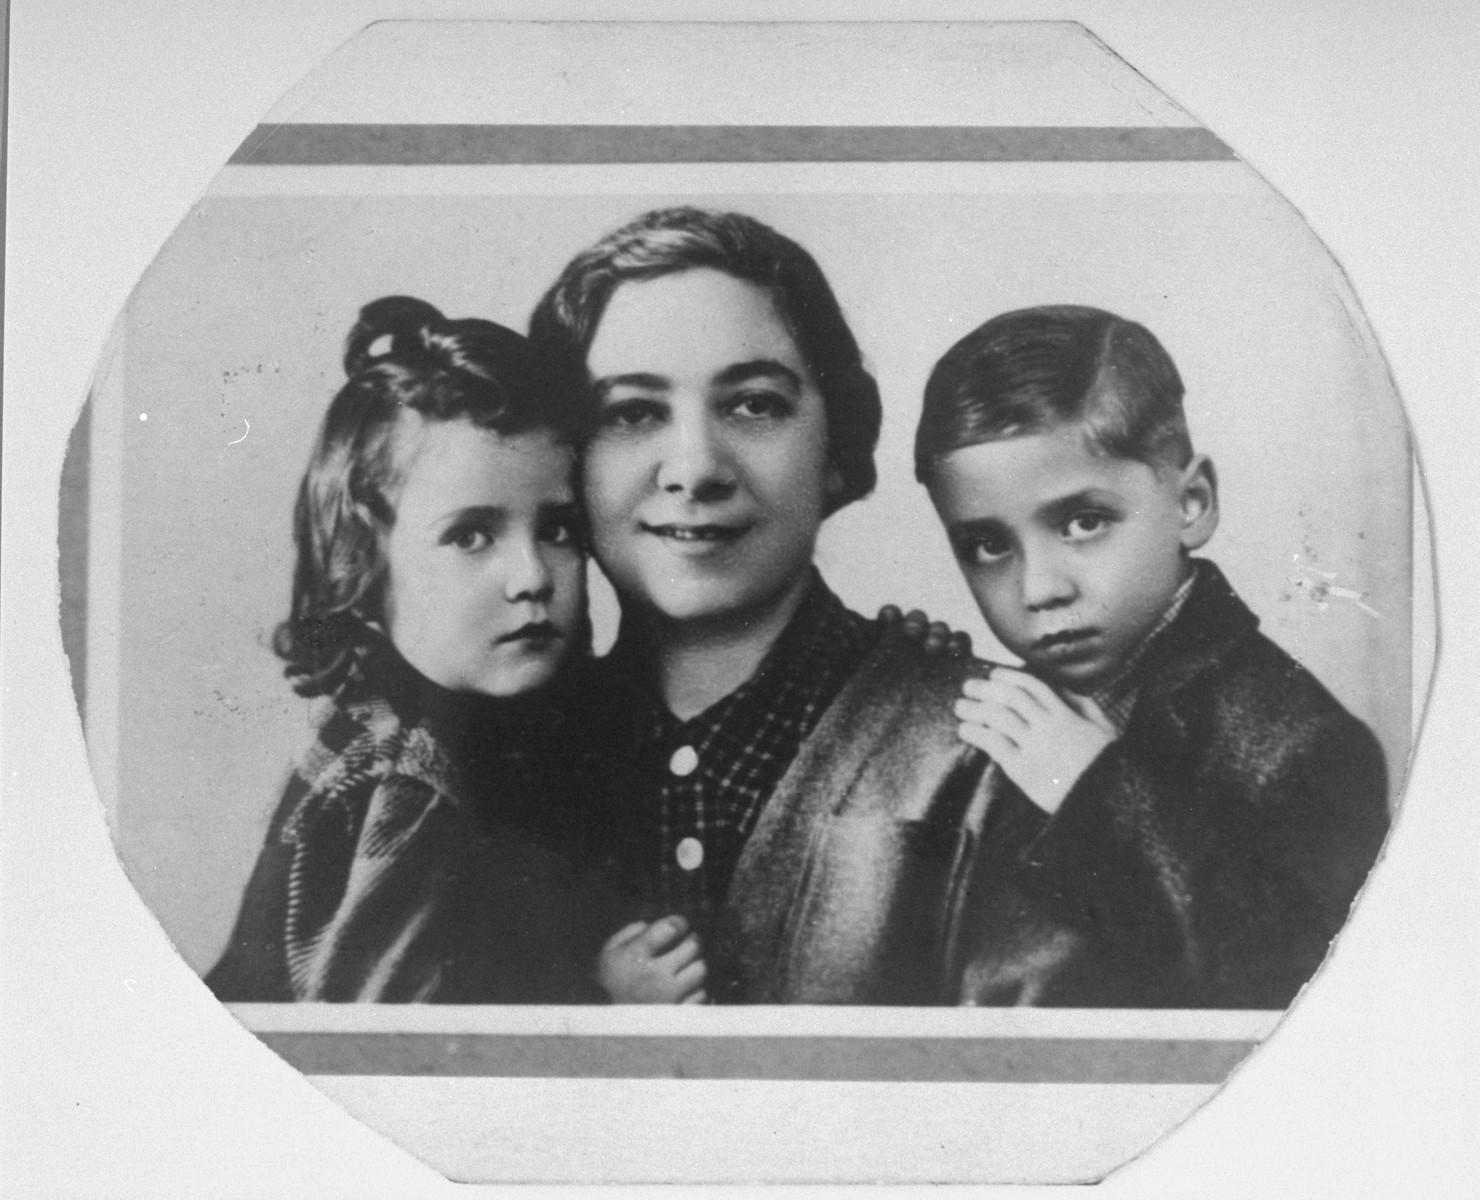 Portrait of Ita Guttman with her twin children Rene and Renate.